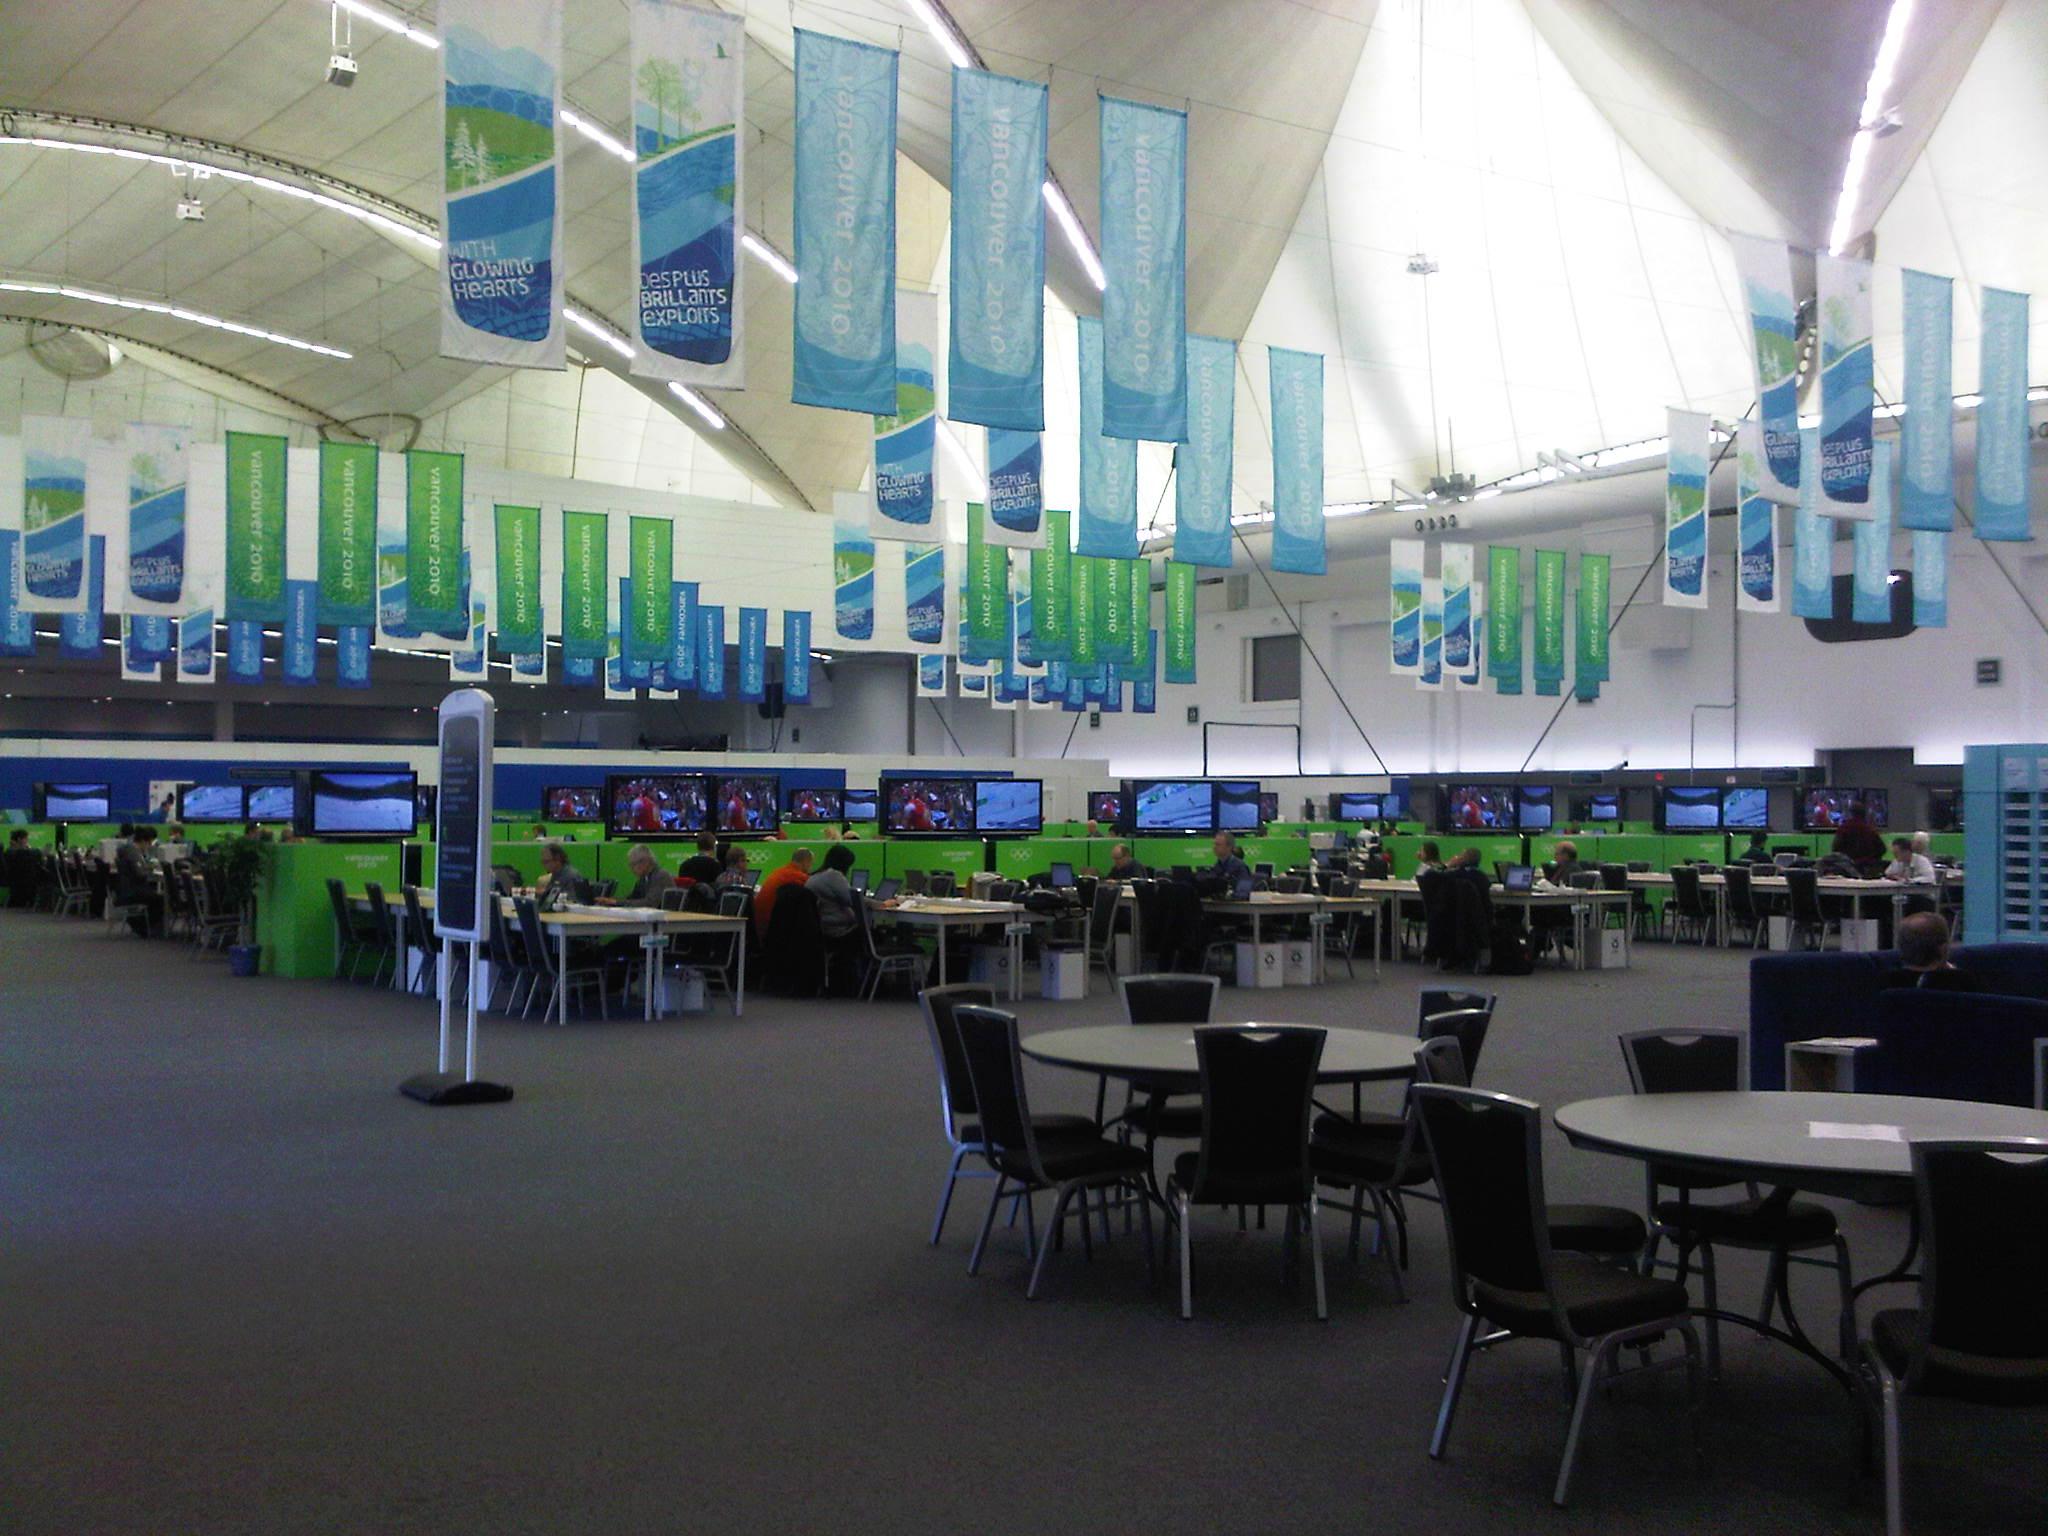 The big press gallery